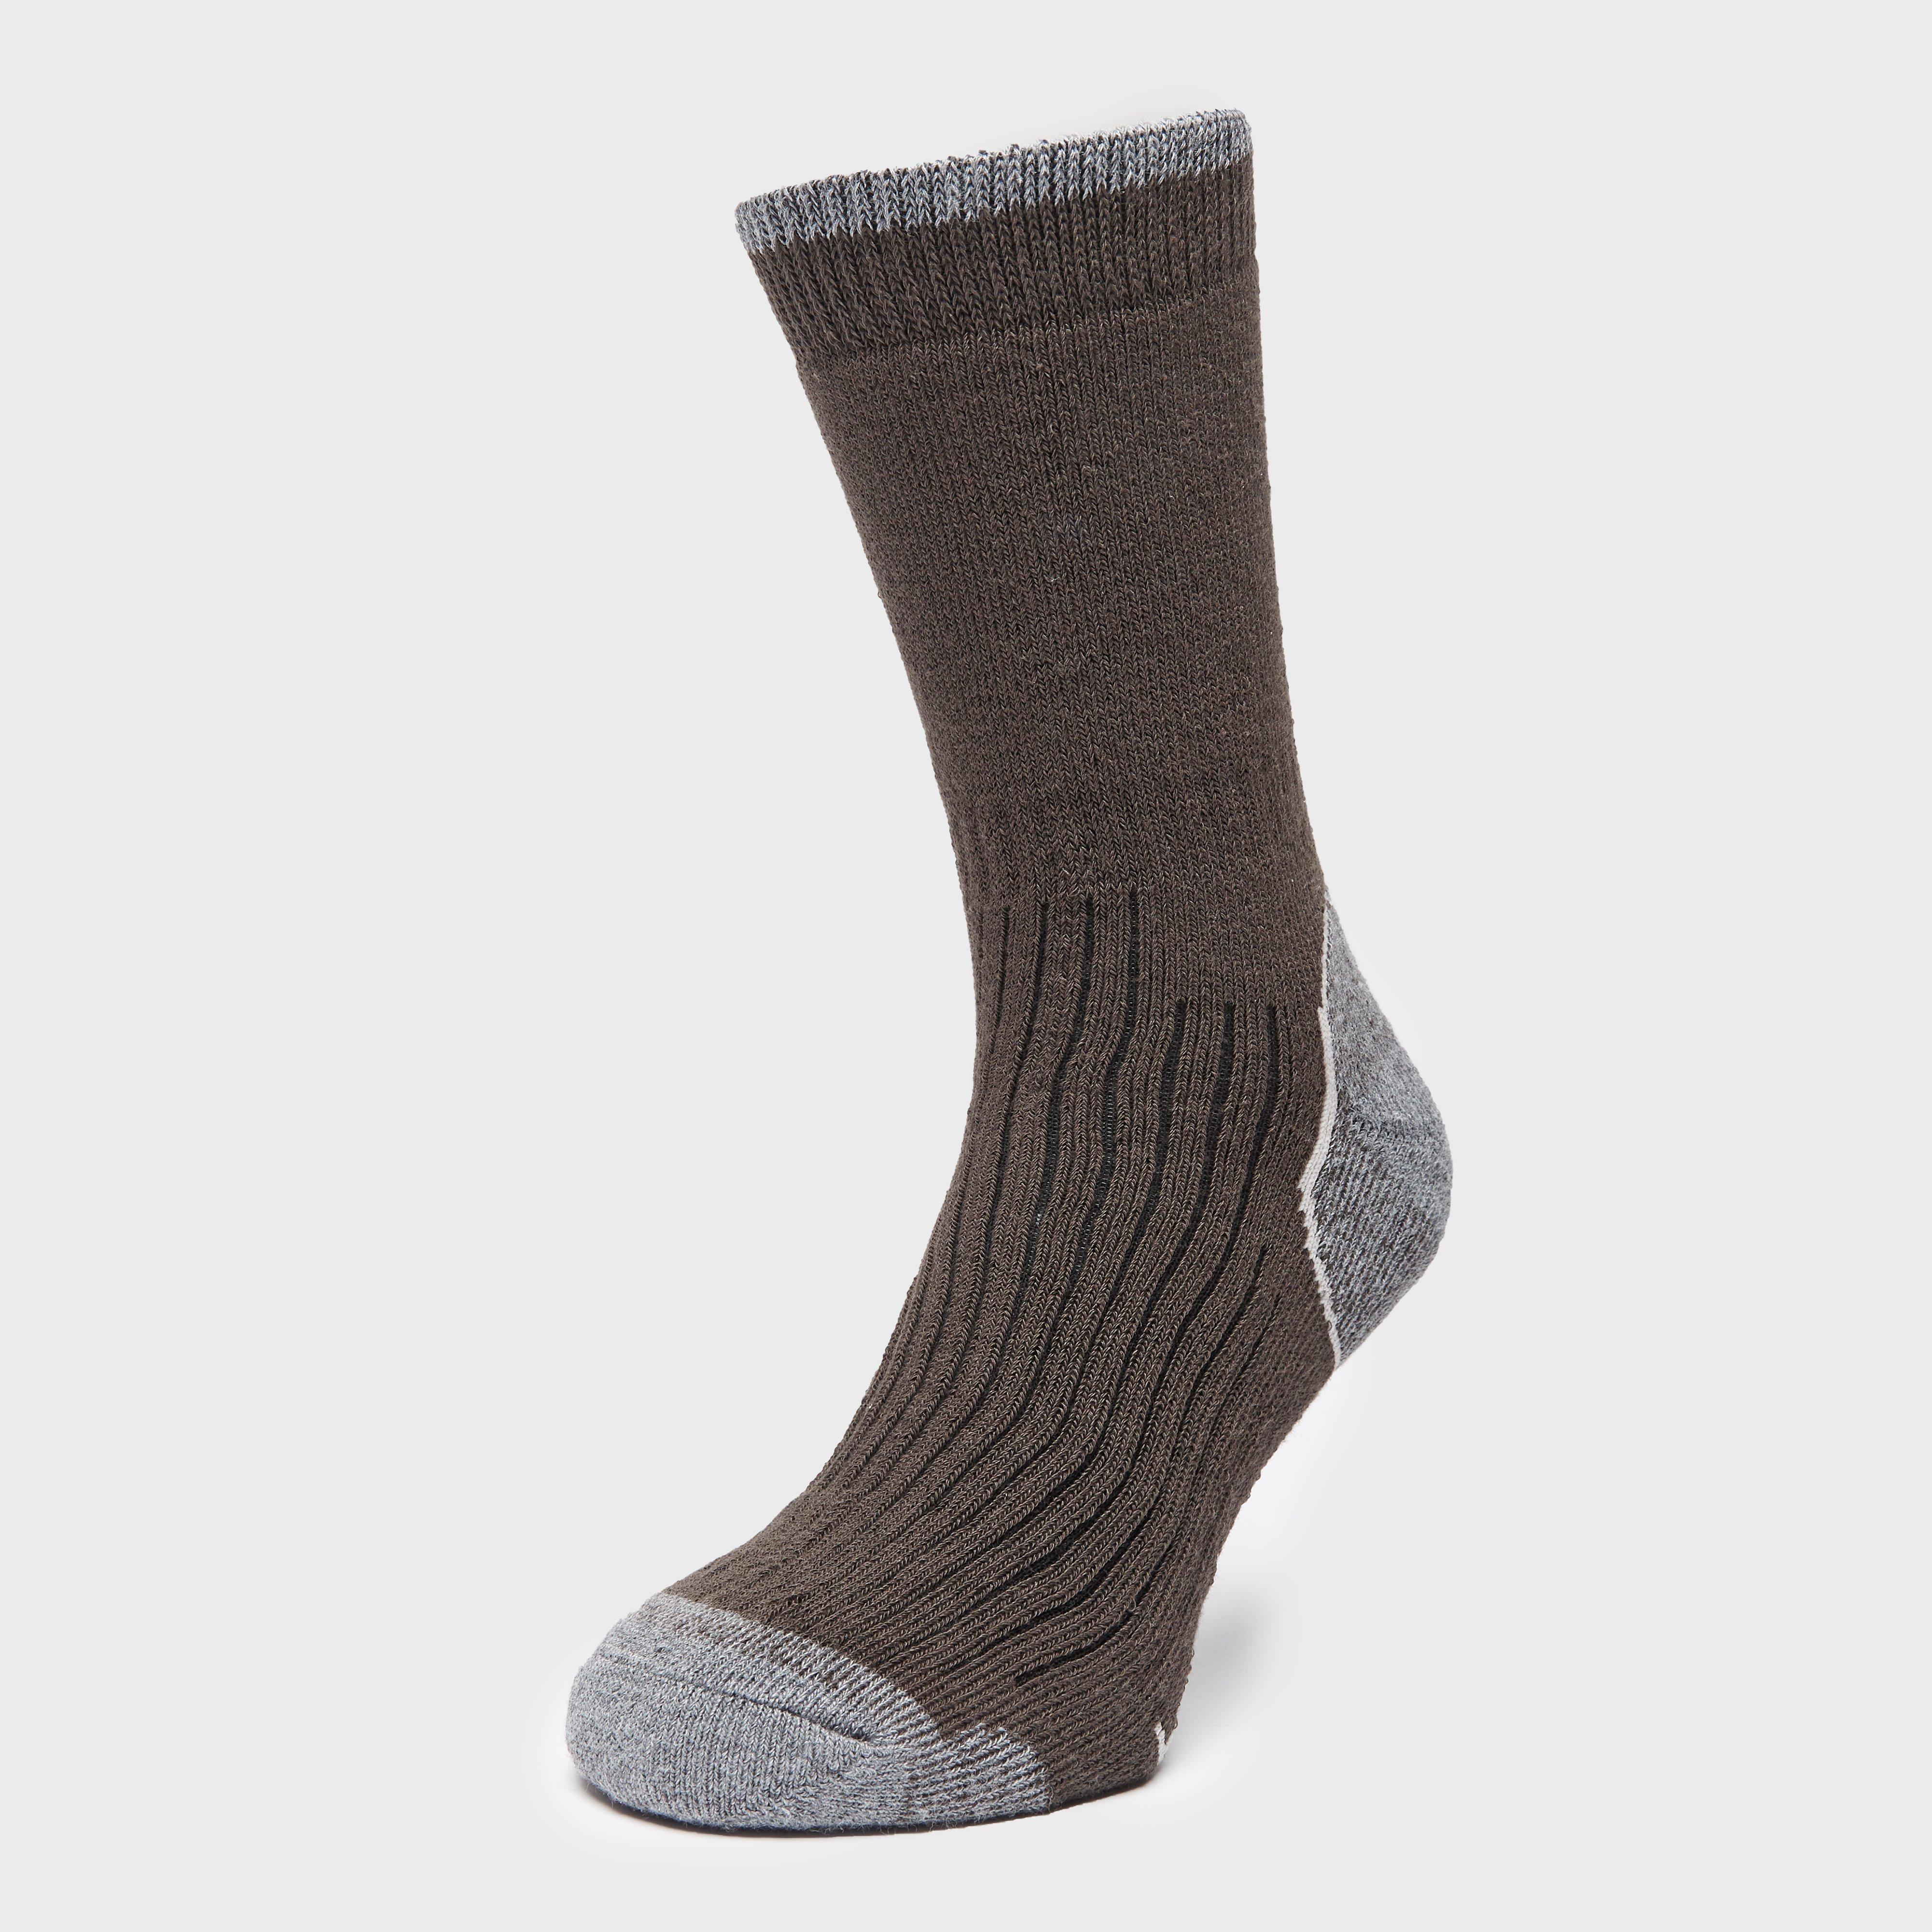 Brasher Mens Hiker Socks - Brown/blk/gry  Brown/blk/gry